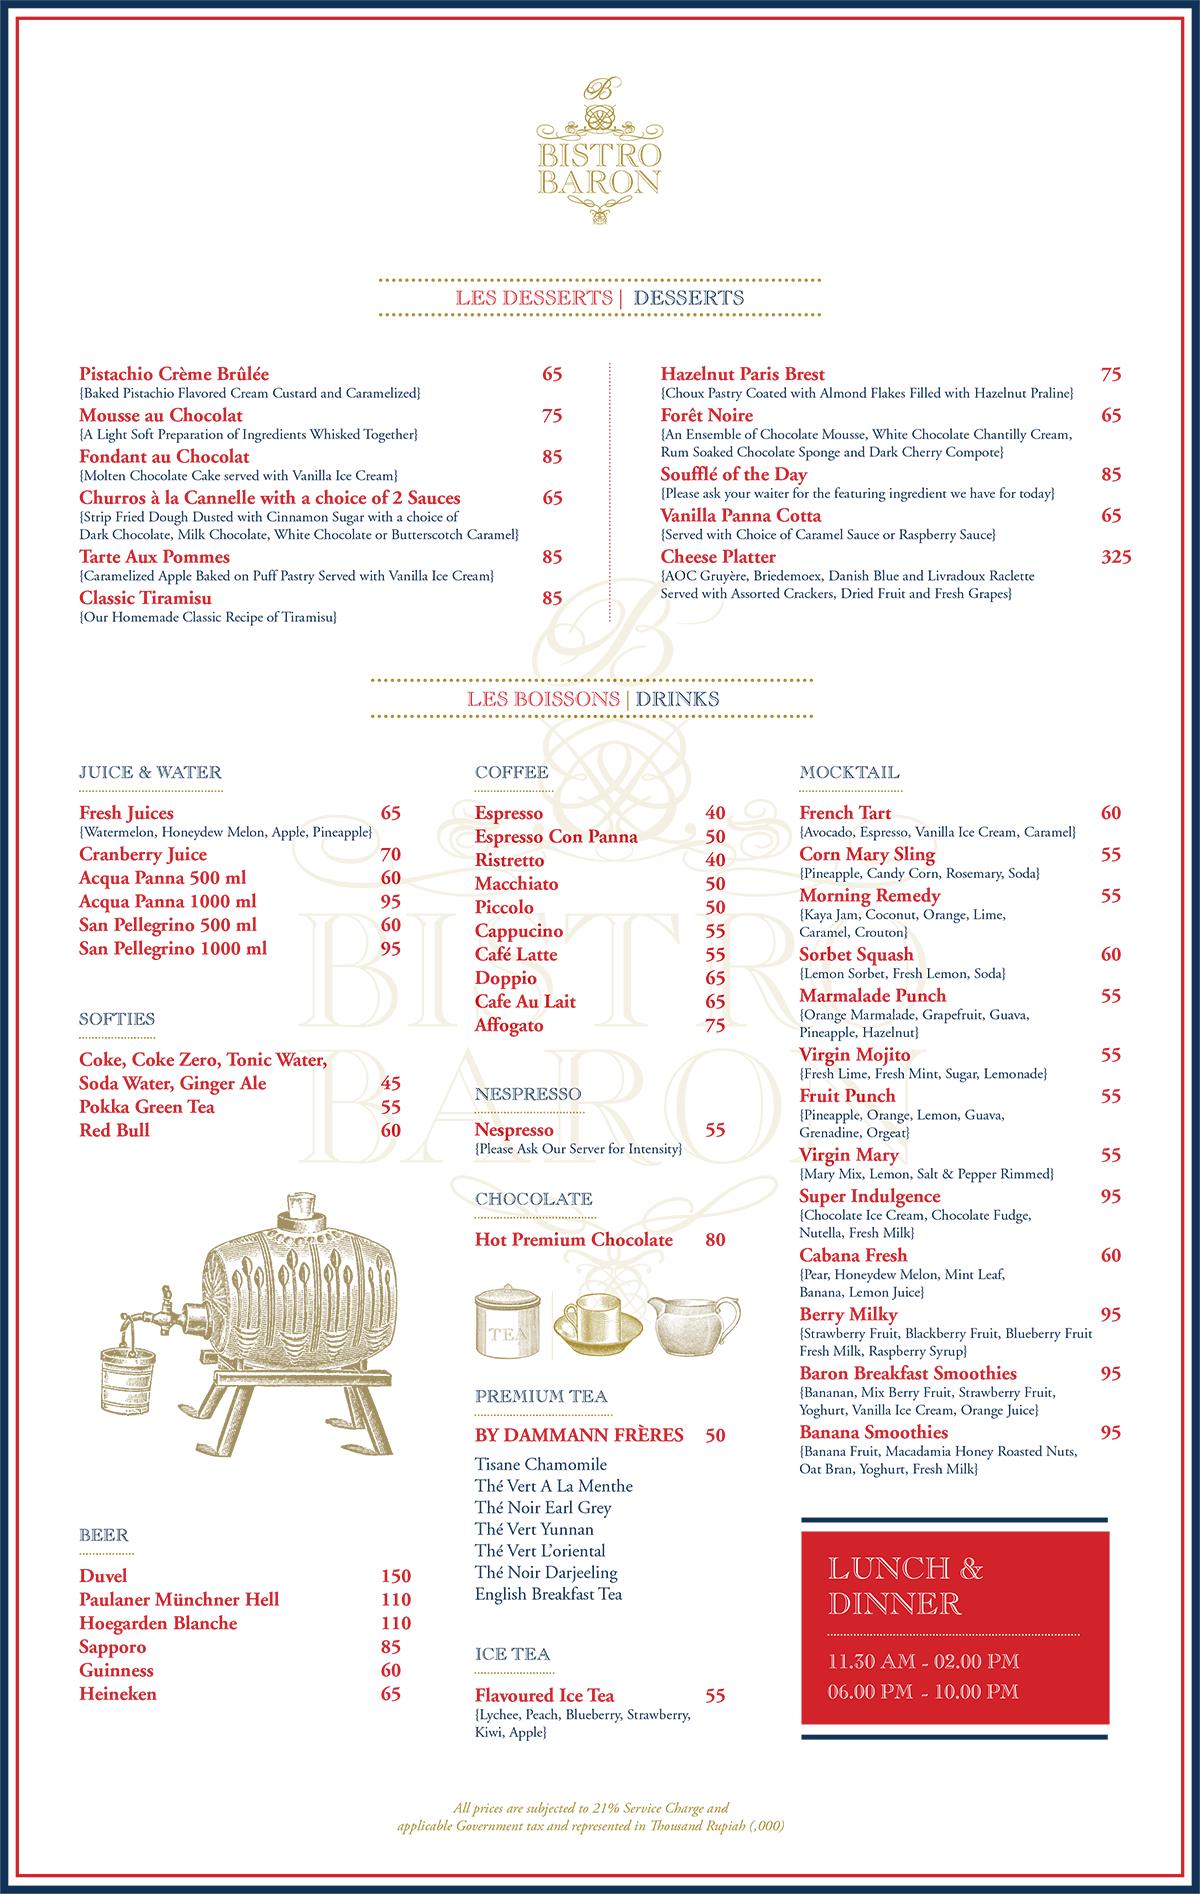 Bistro Baron Chope Restaurant Reservations Voucher Eric Kayser Hours